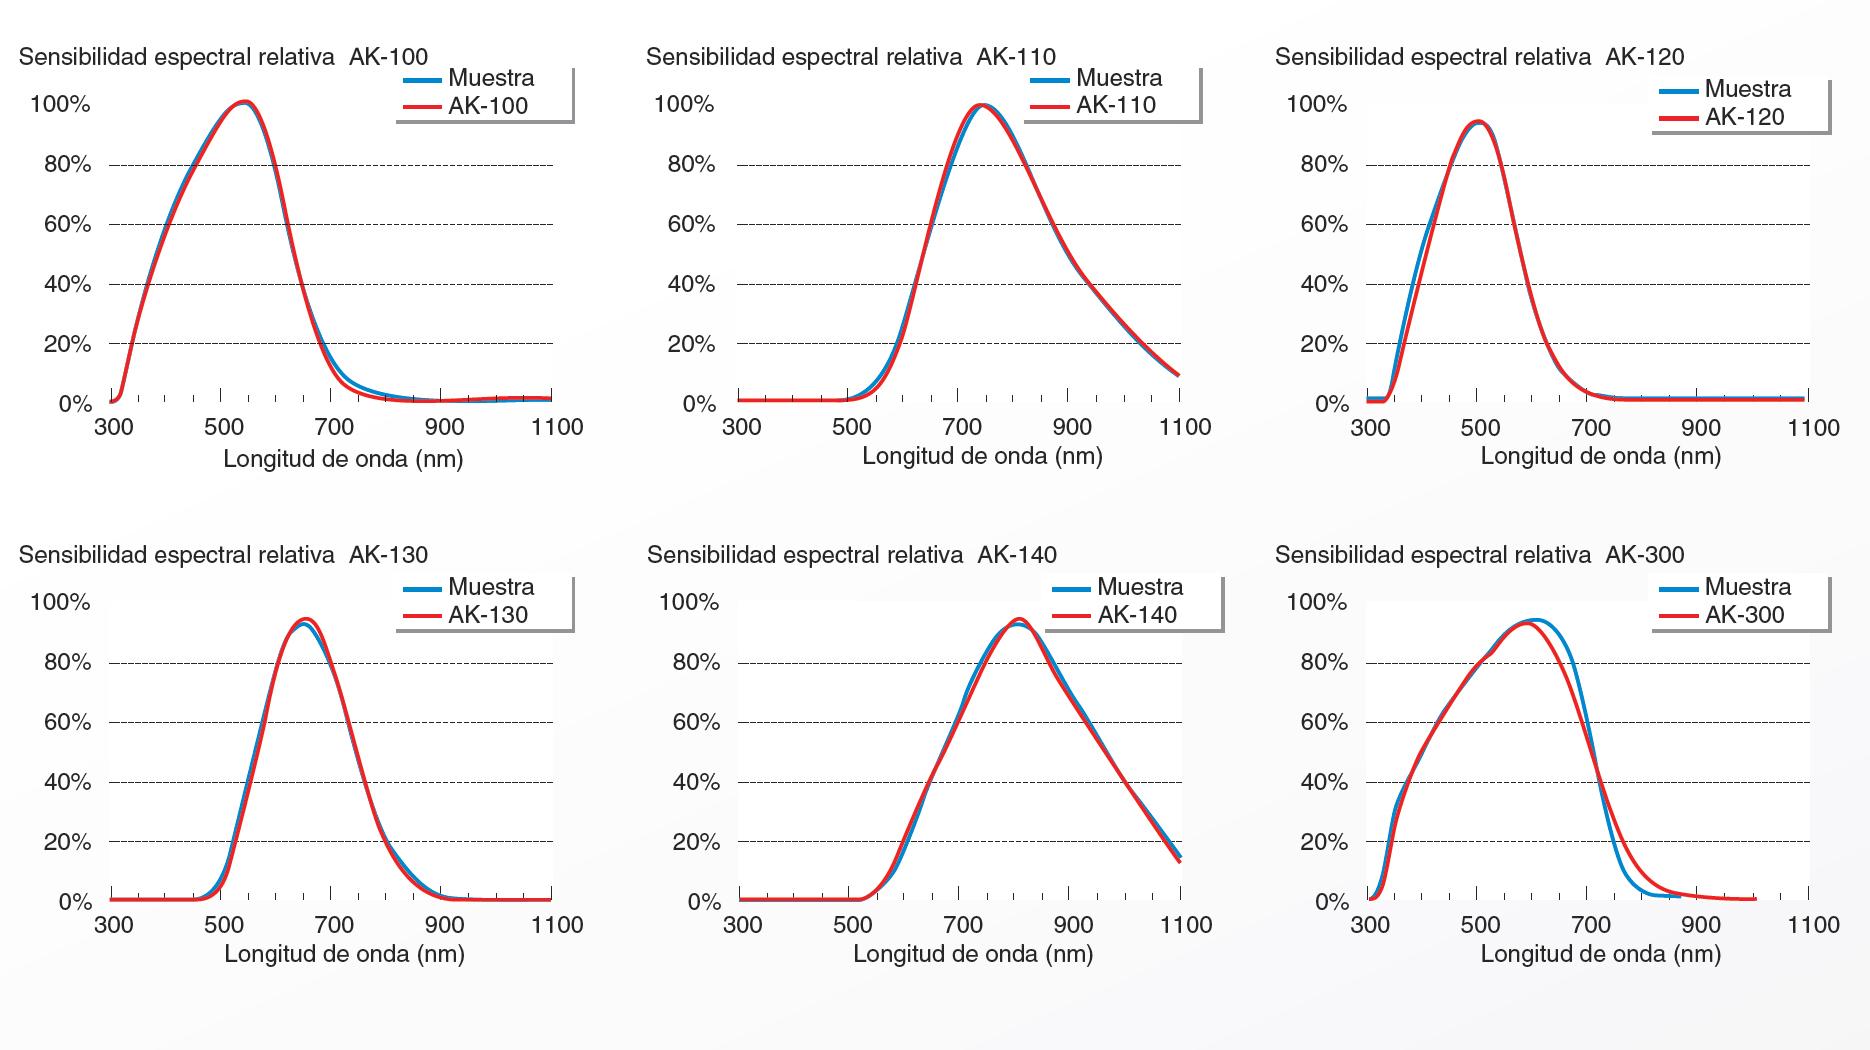 sensibilidad-espectral-fotovoltaicas